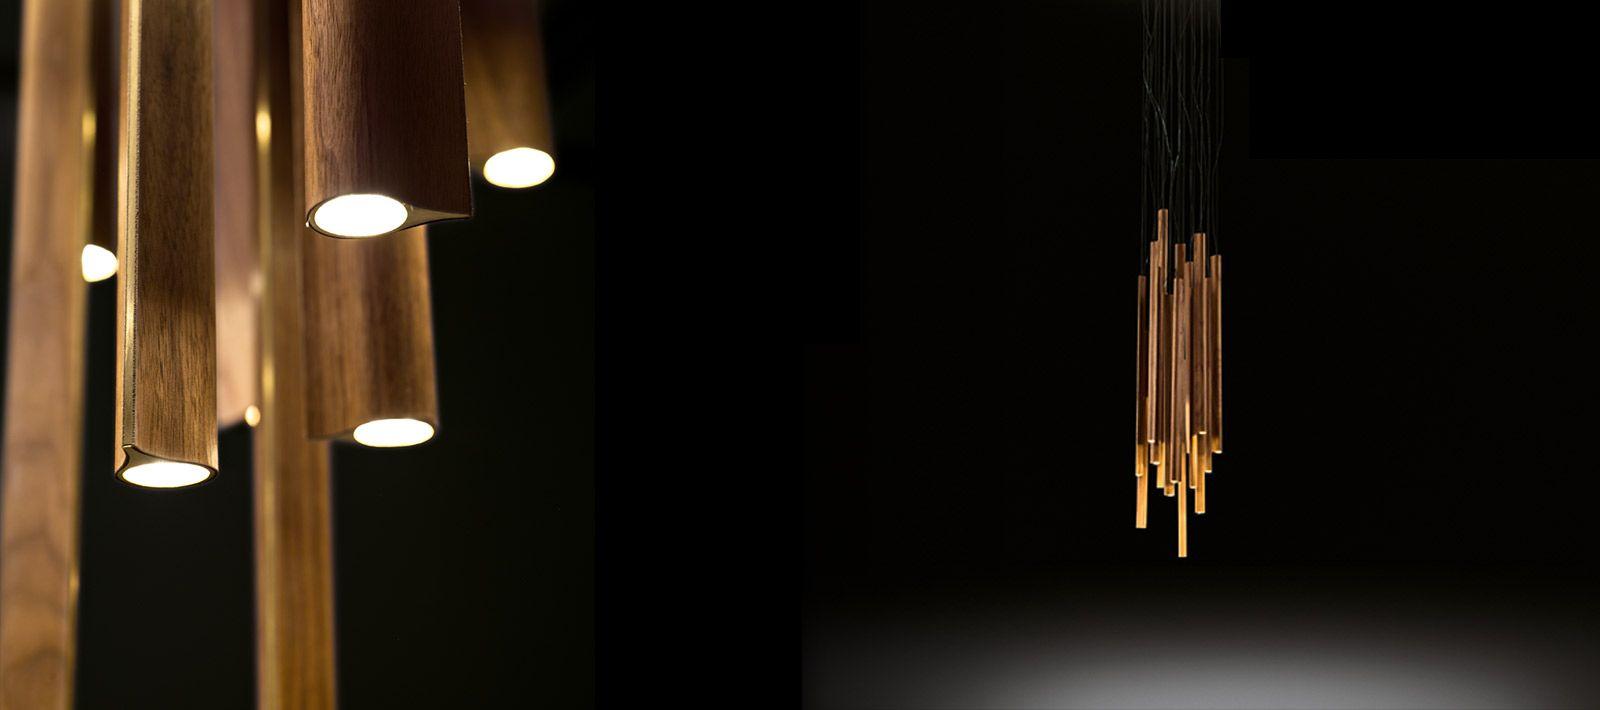 Giorgetti leaf centro ricerche 2014 lighting pinterest giorgetti made in italy leaf suspension lamp project by centro ricerche arubaitofo Choice Image